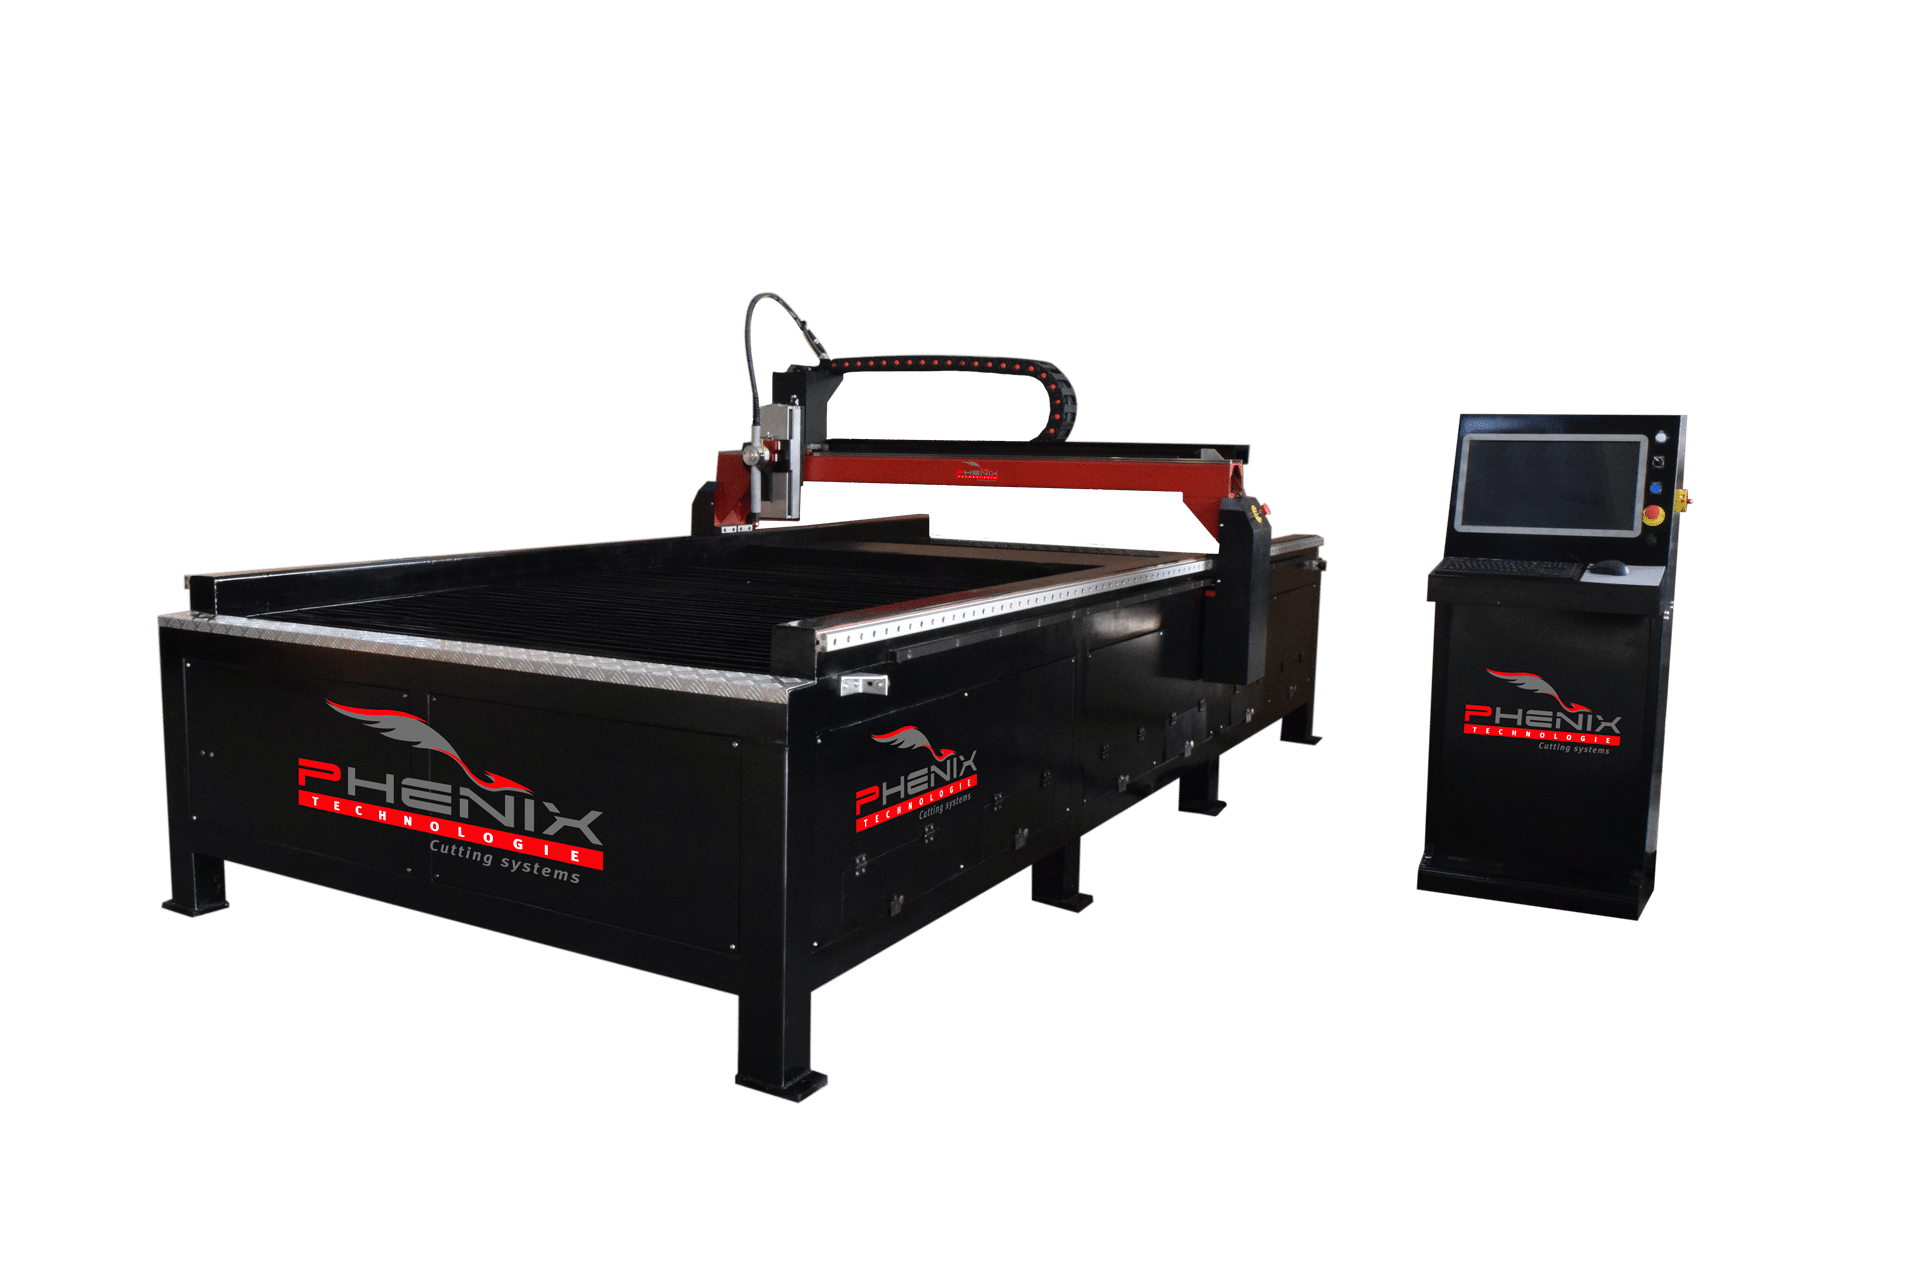 LT cut - Máquina LT Cut de corte por plasma